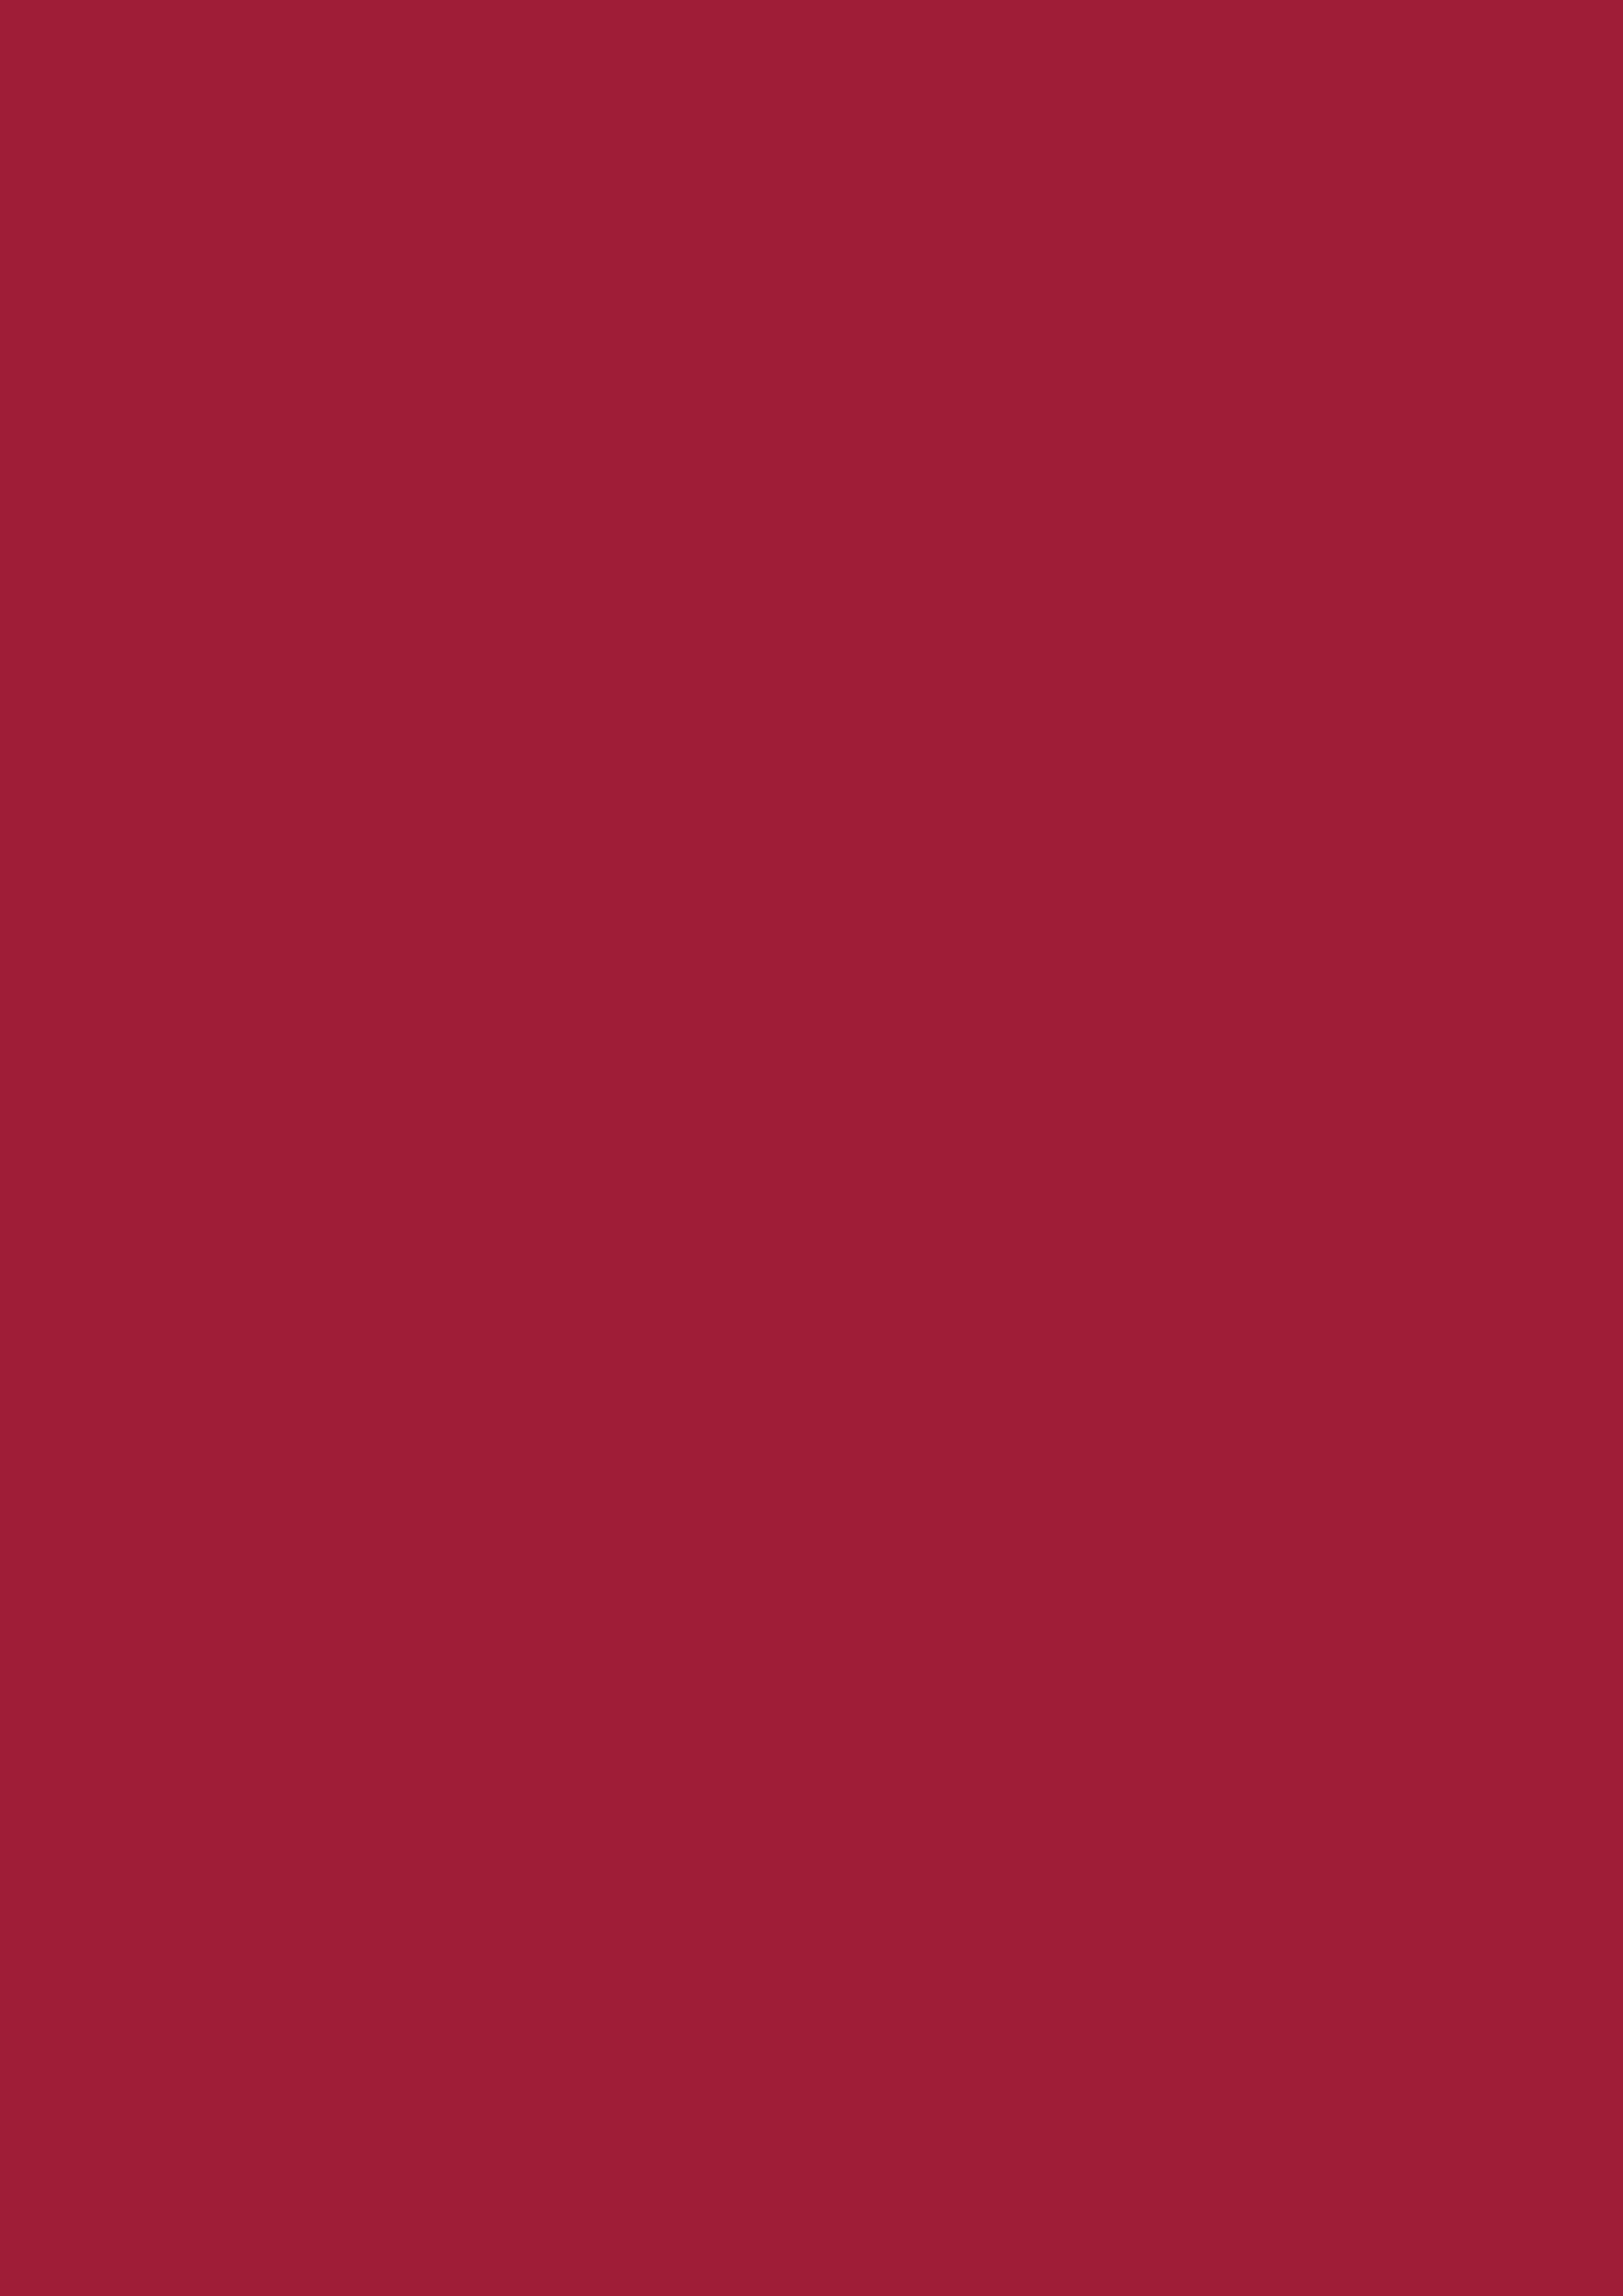 2480x3508 Vivid Burgundy Solid Color Background